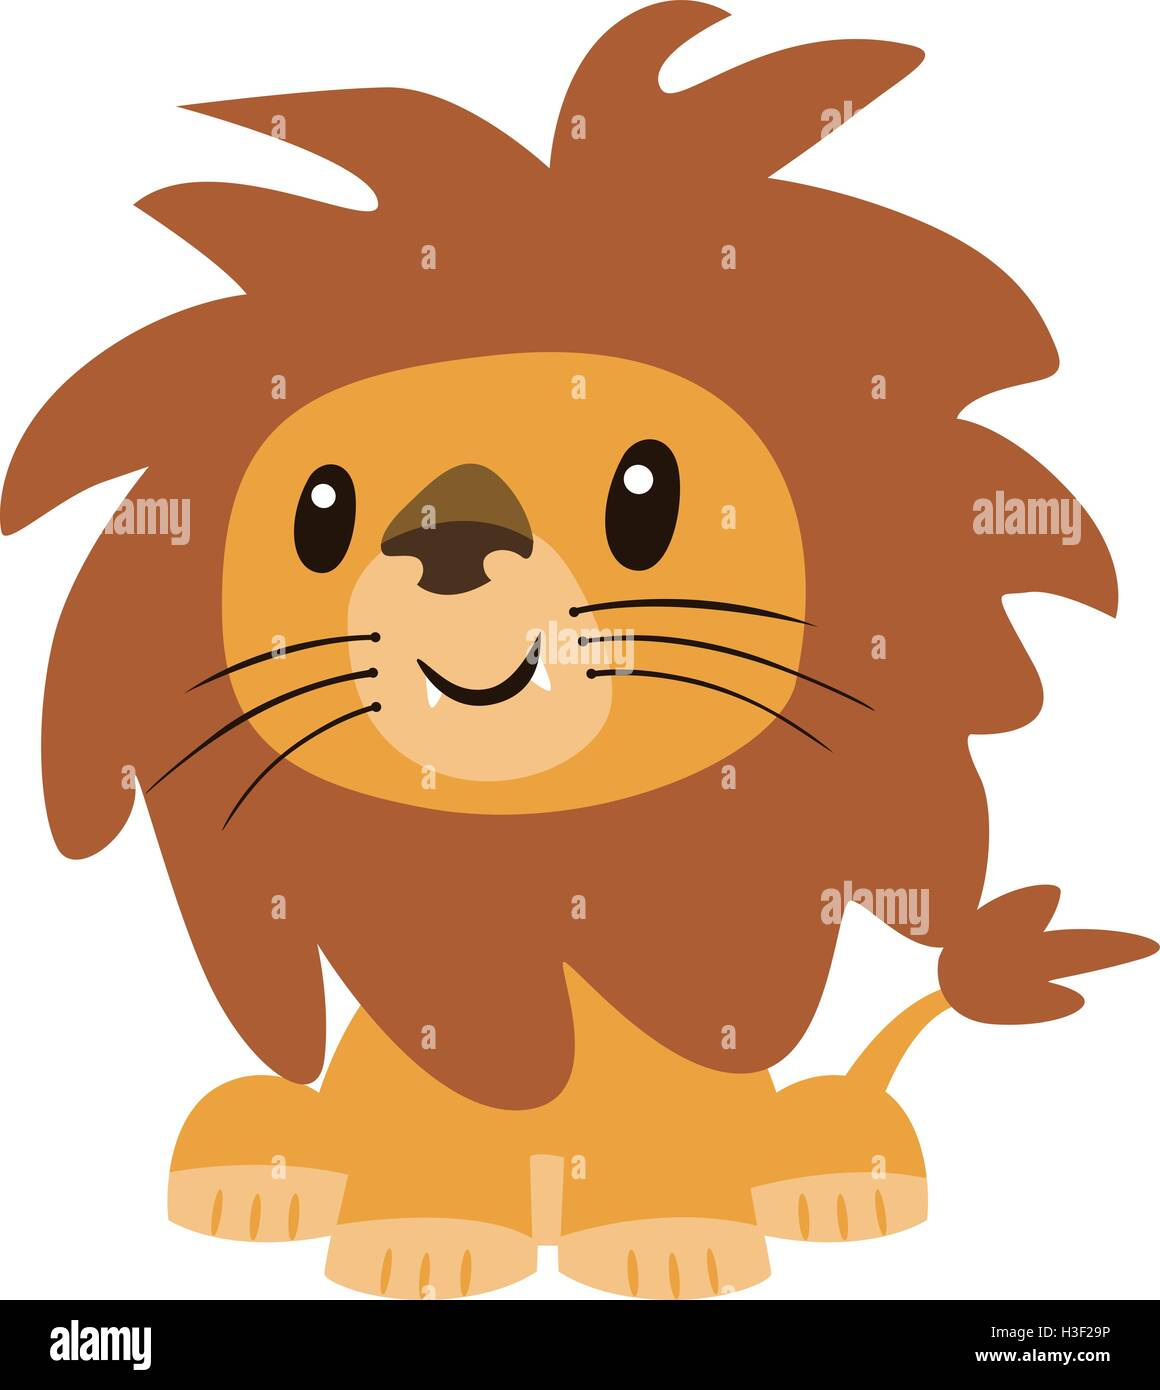 Cute Cartoon Character Design : Cute lion cartoon vector character design stock art